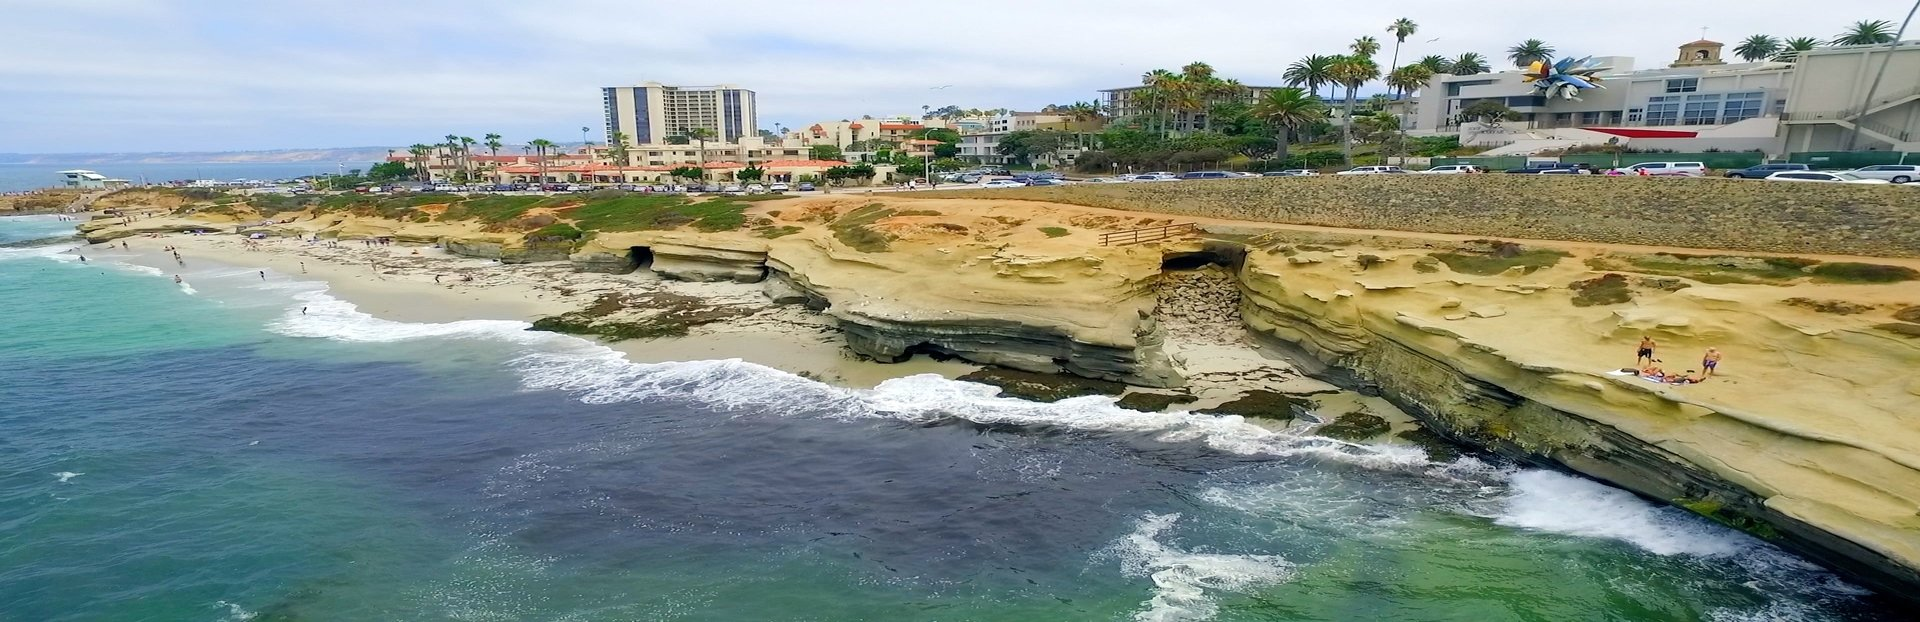 San Diego audio tour: La Jolla: The Riviera of California